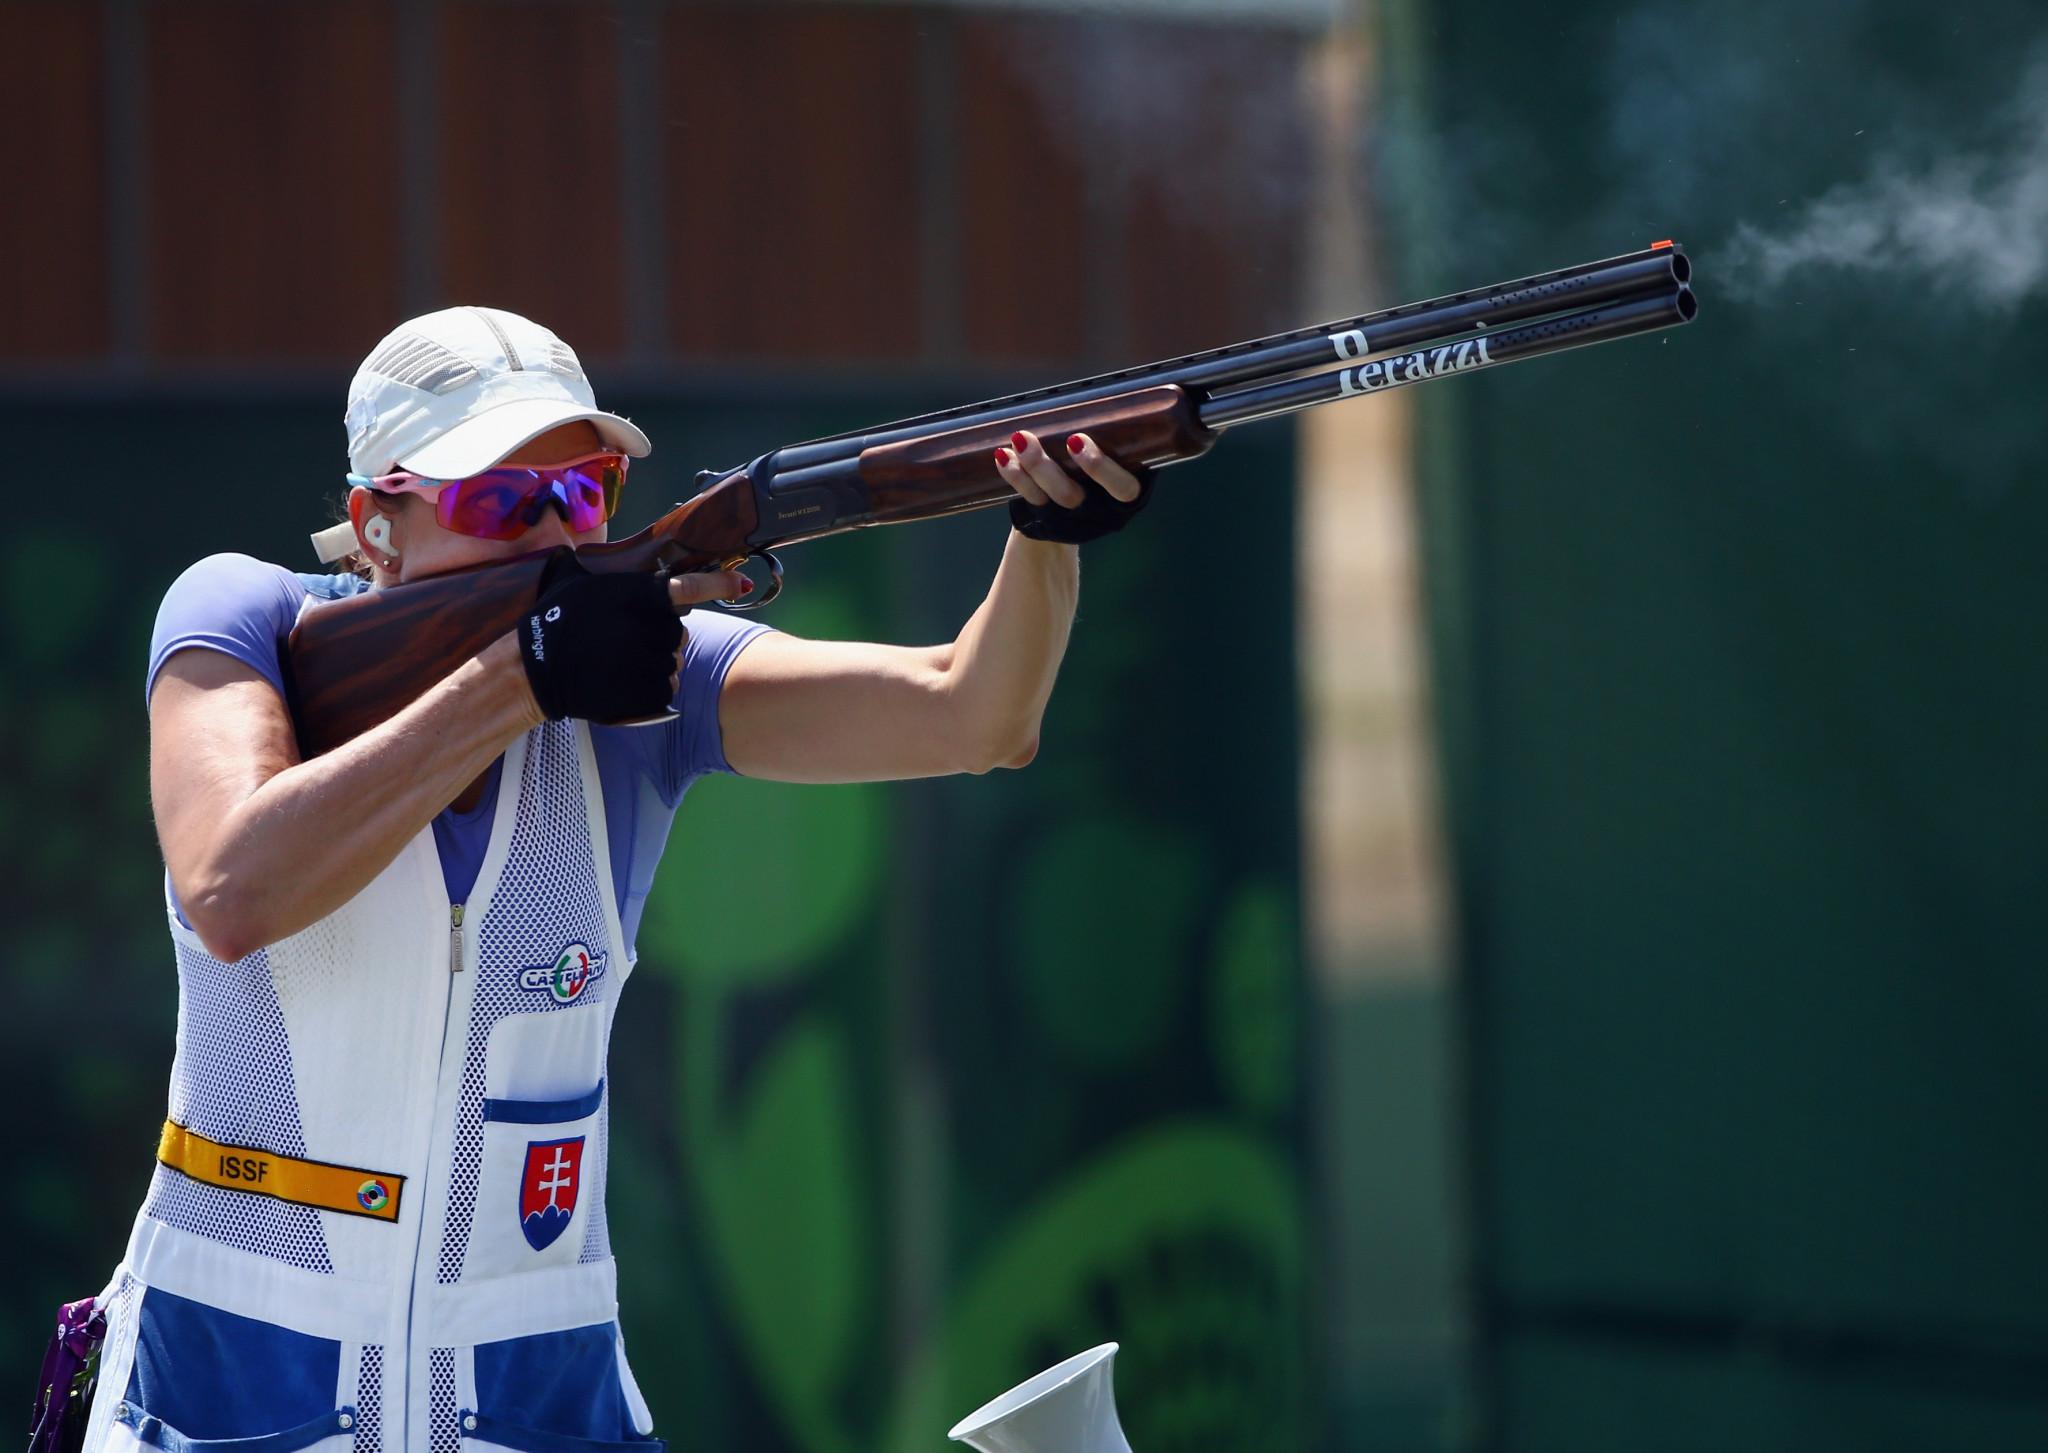 Barteková wins women's skeet title at European Shotgun Championships